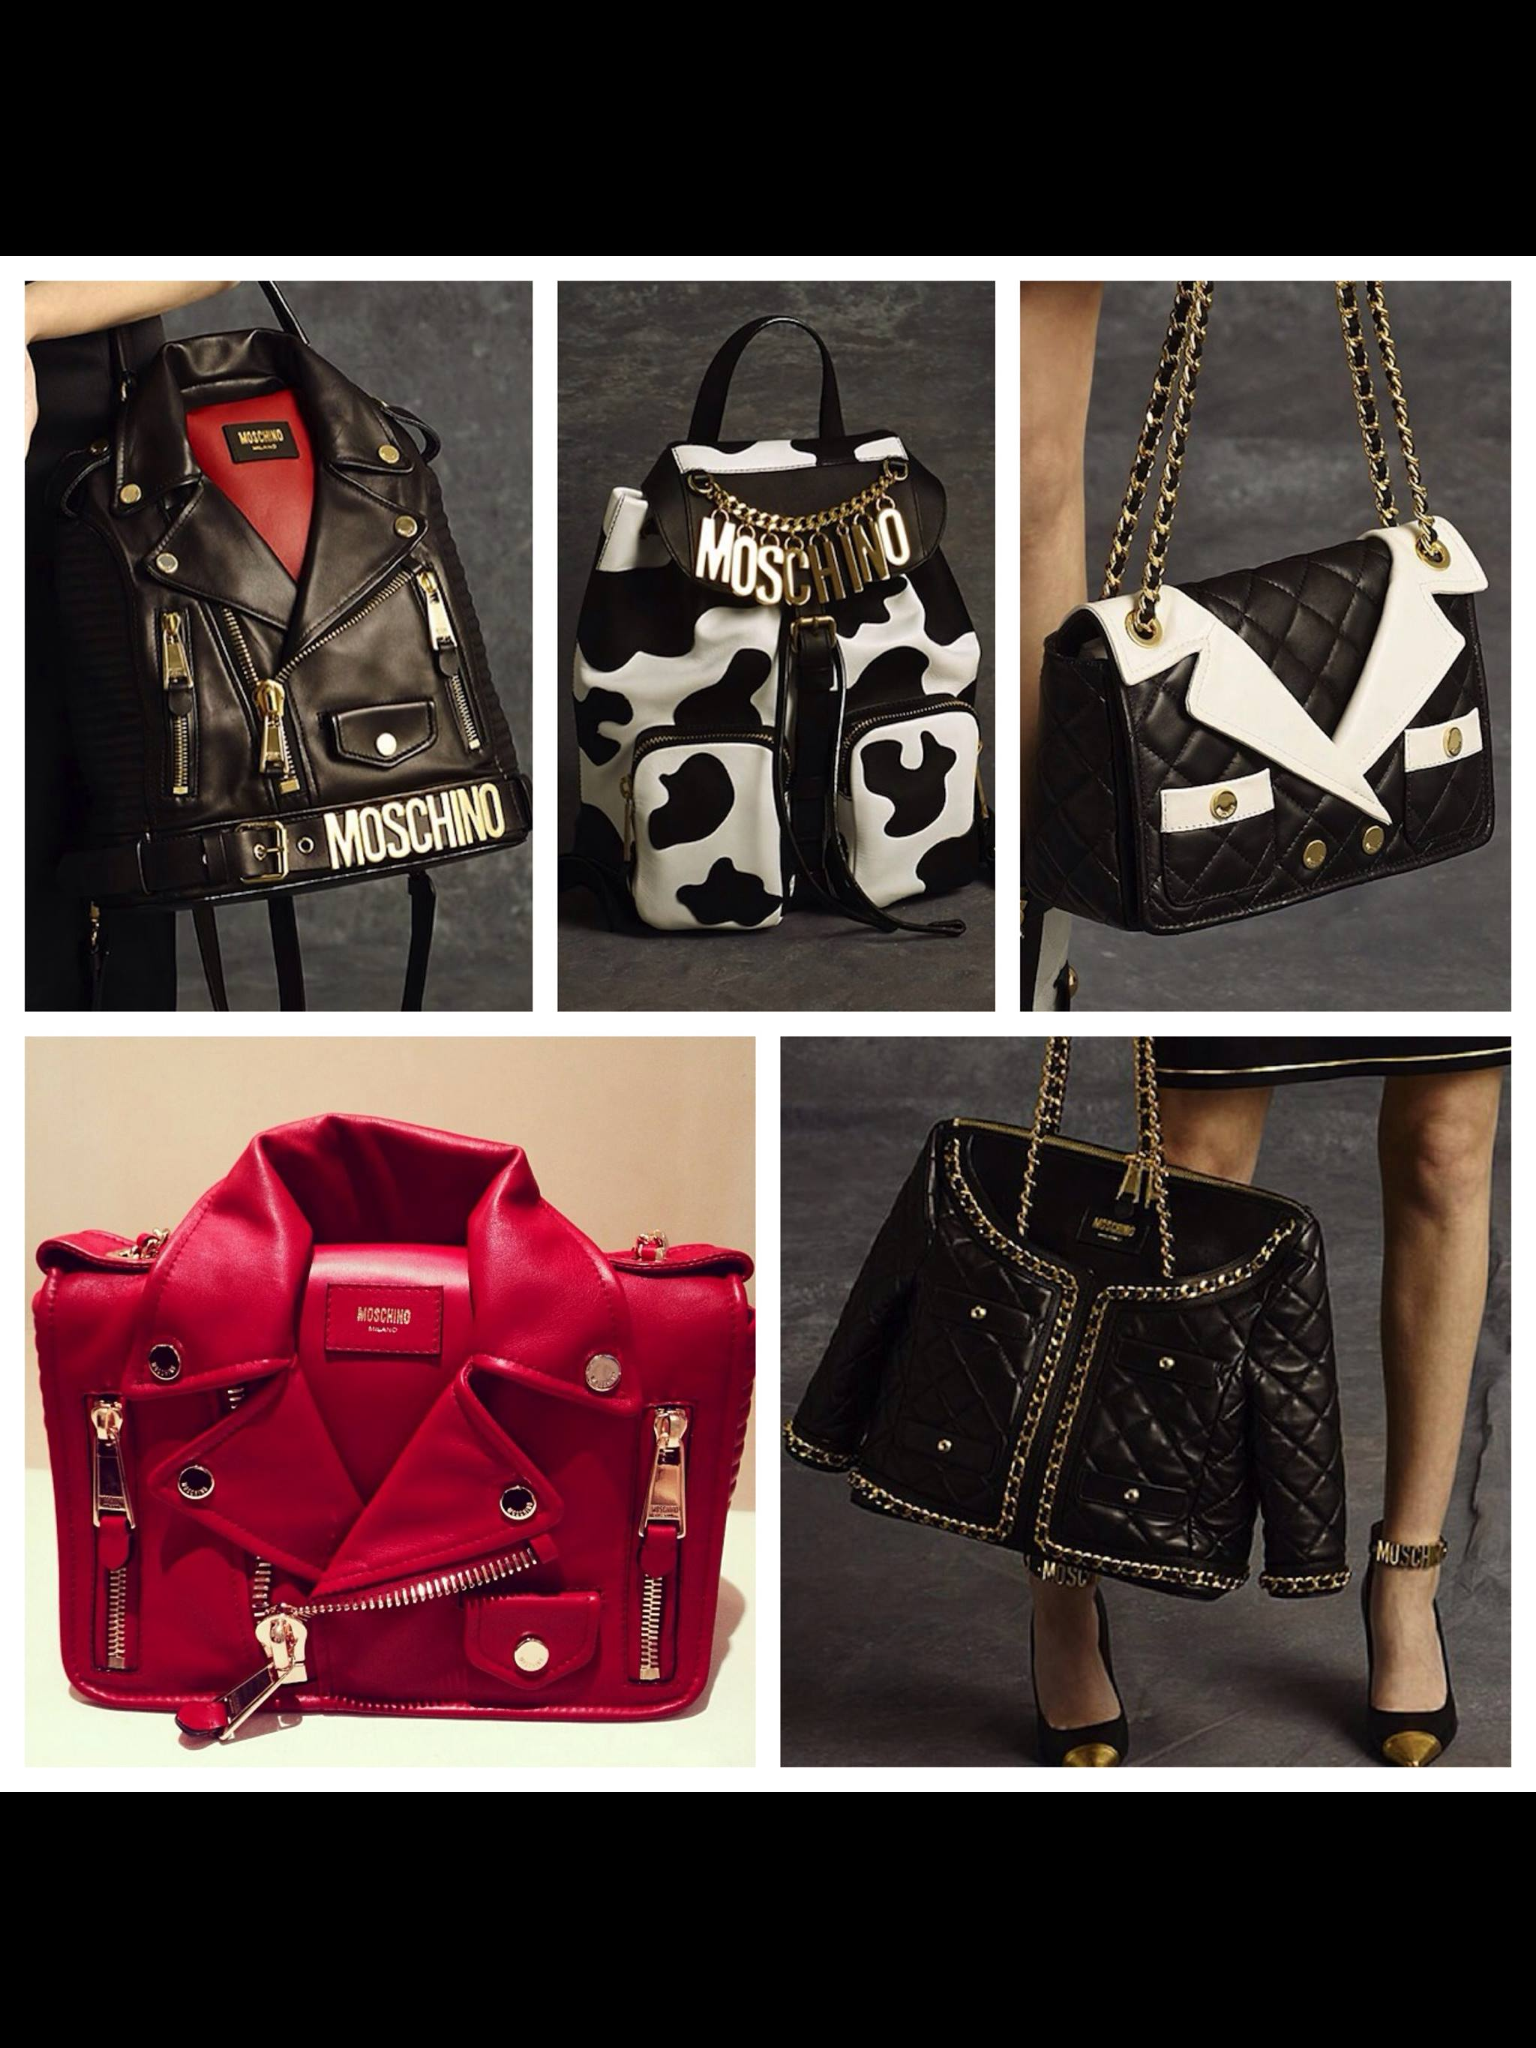 d3b8ecfc4 Chanel Handbags, Chanel Bags, Clothing Items, Classic Handbags, Best  Handbags, Bucket